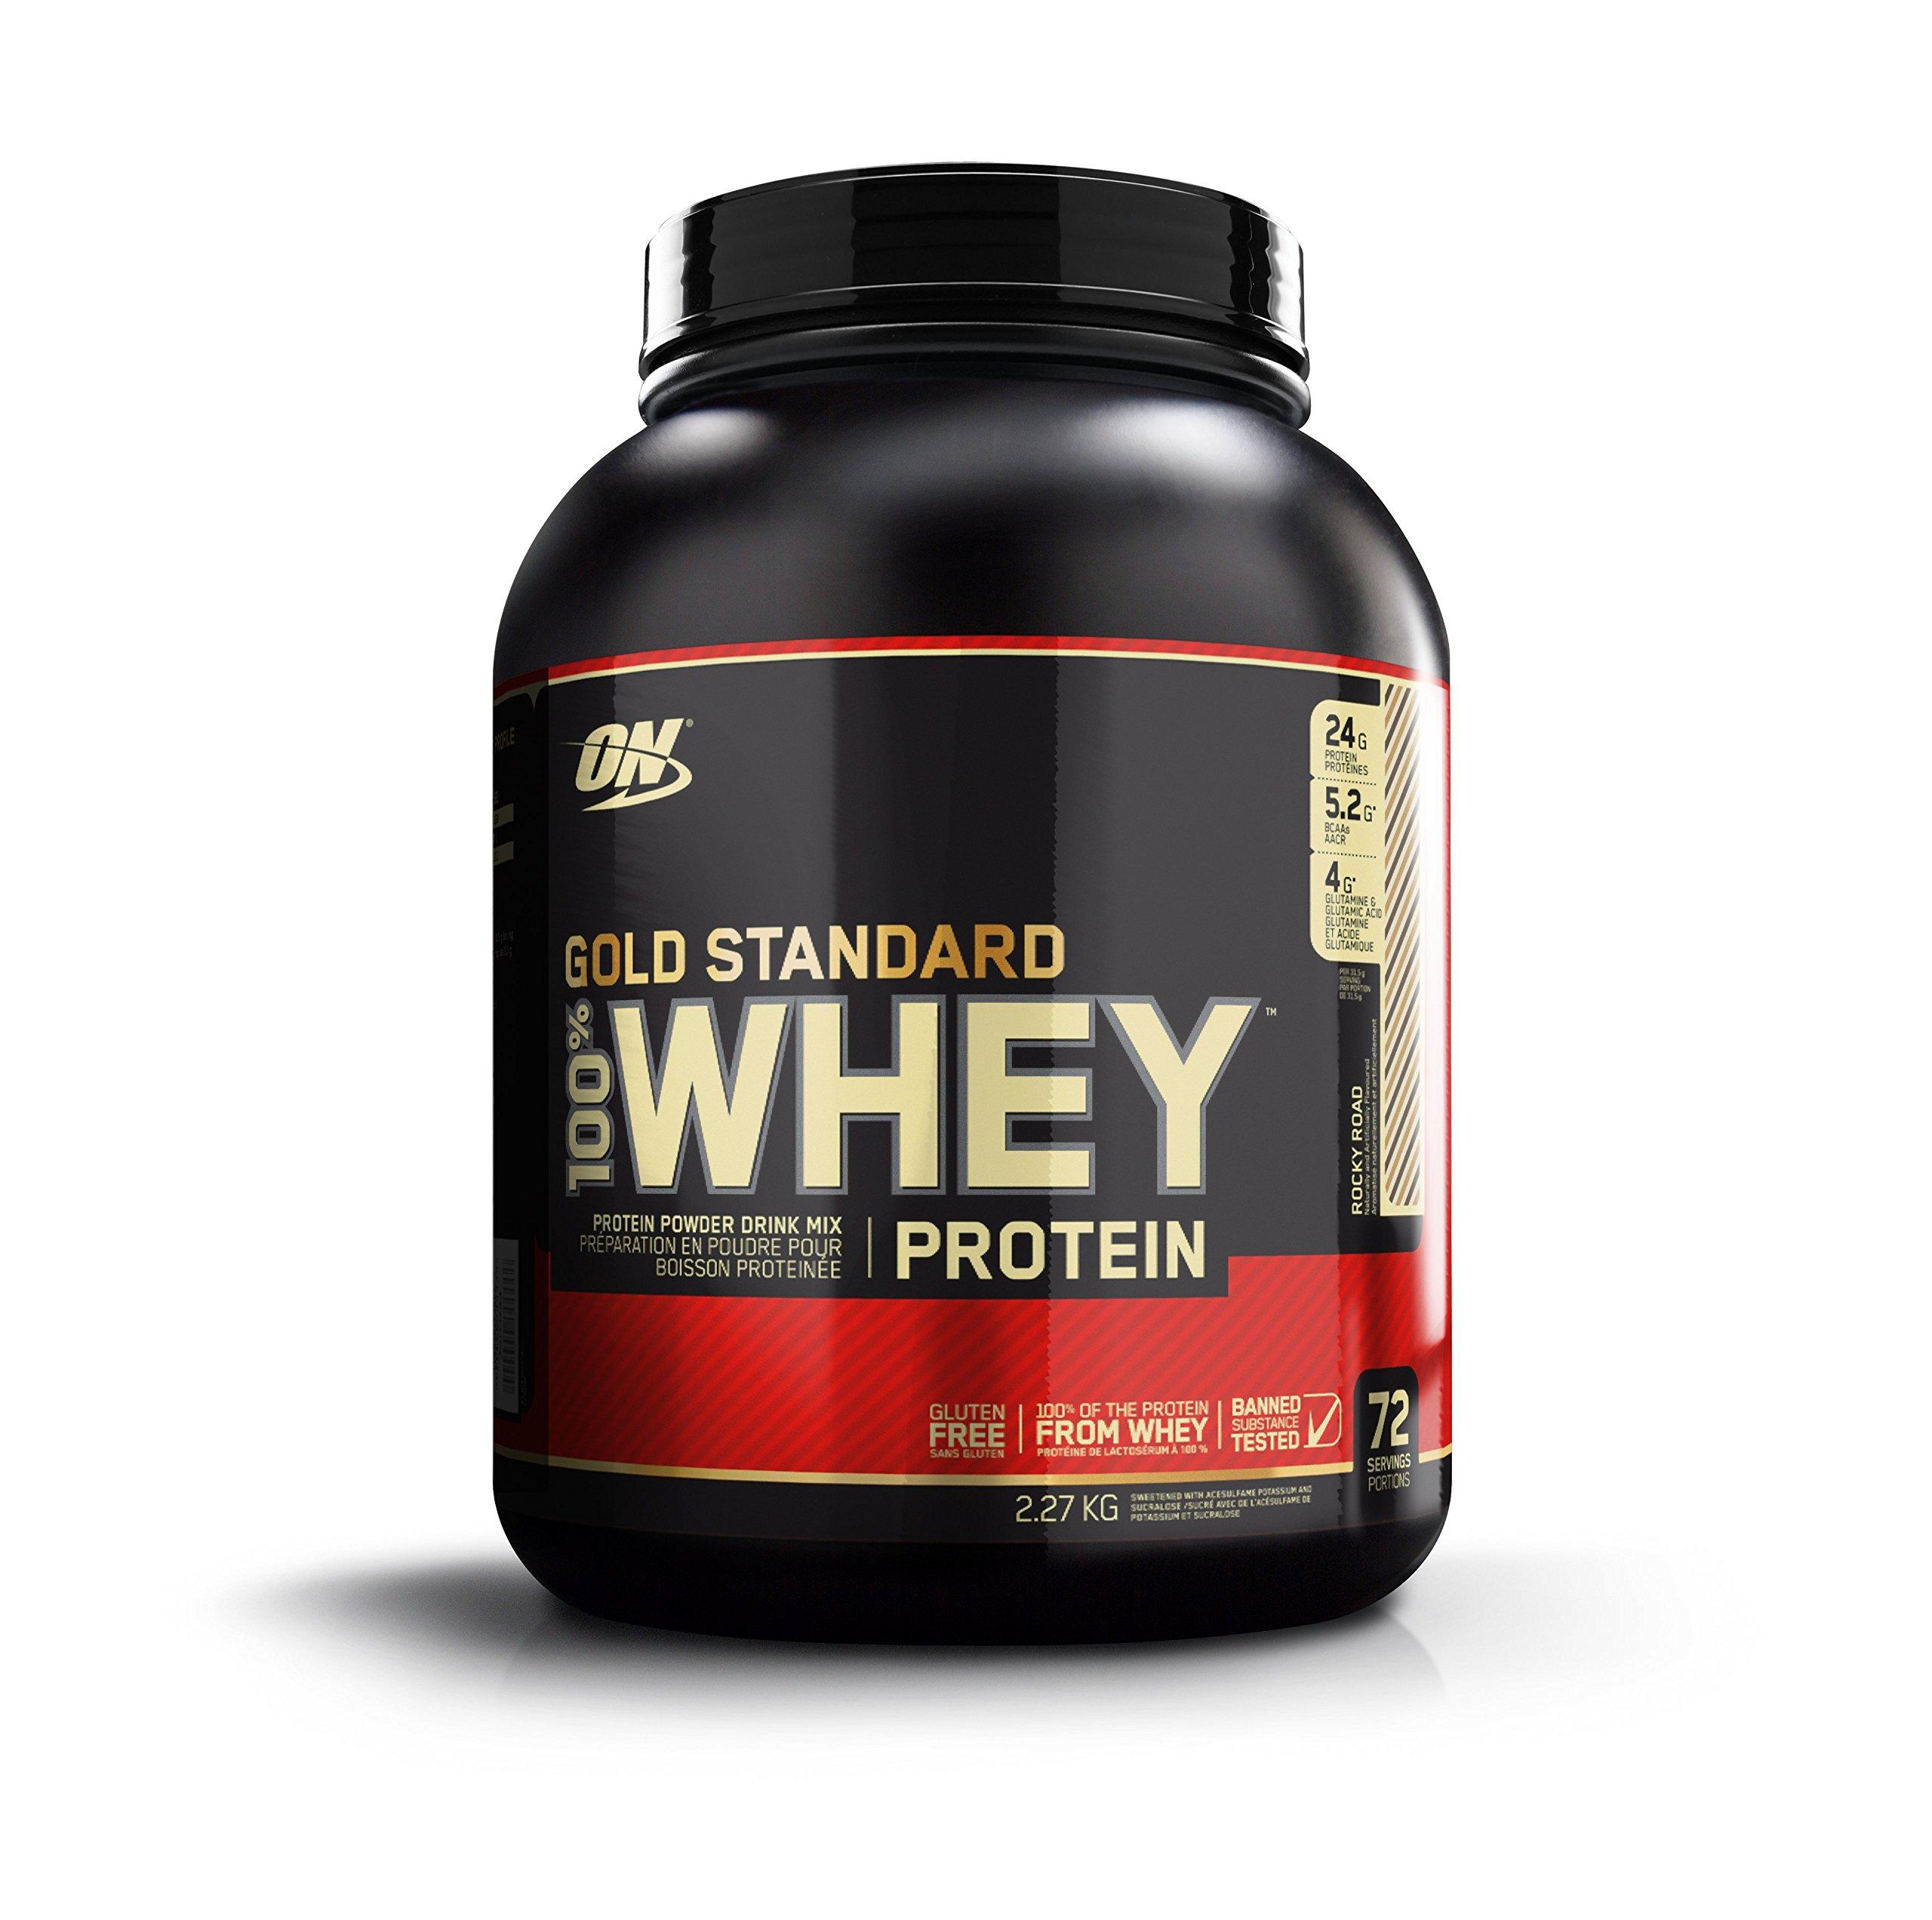 Optimum Nutrition Gold Standard 100% Whey Protein Powder, Rocky Road, 5 Pound